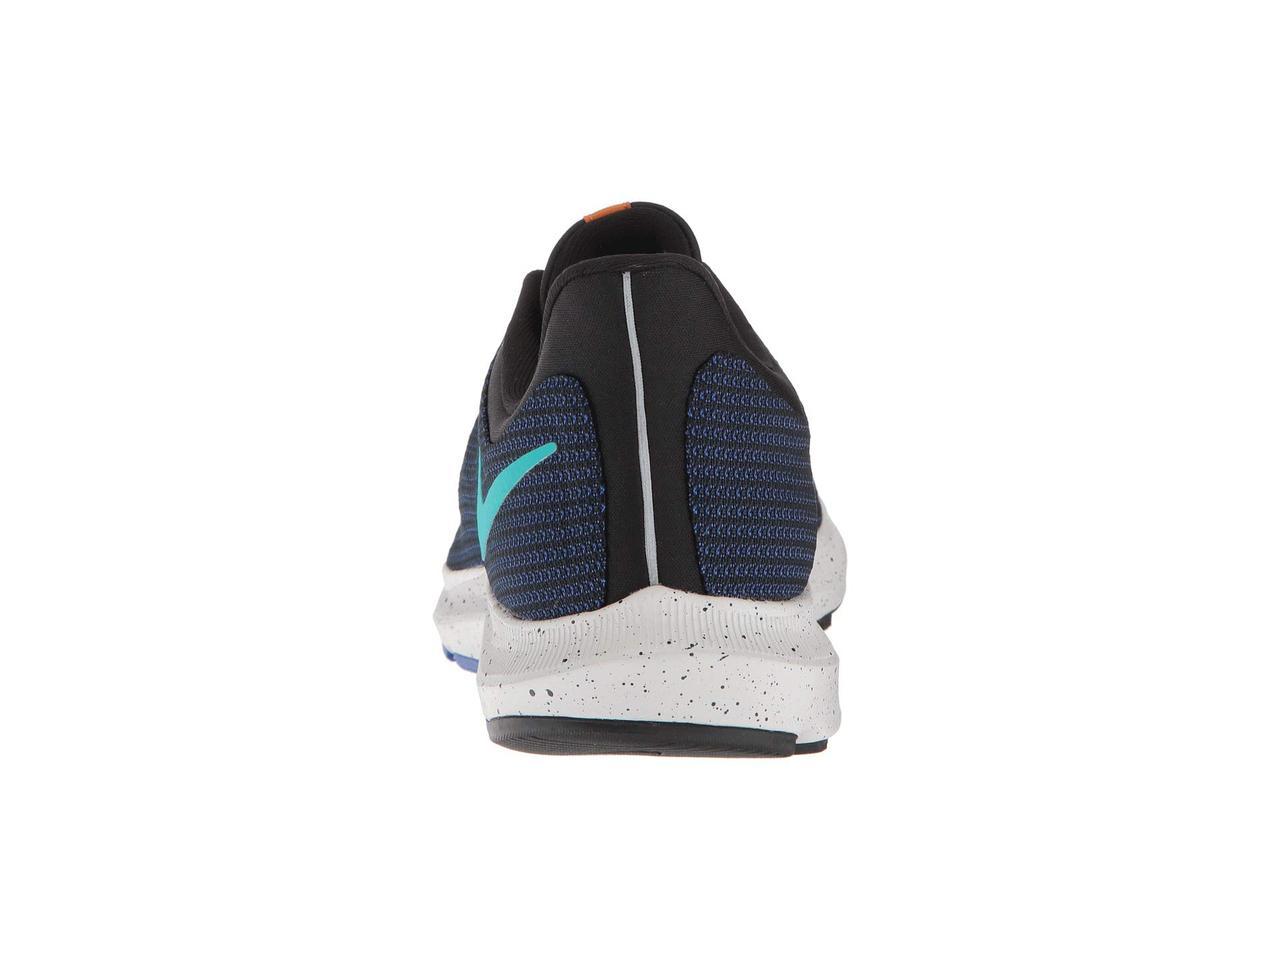 b65ebecc ... Кроссовки/Кеды (Оригинал) Nike Quest SE Black/Clear Jade/Hyper Royal ...